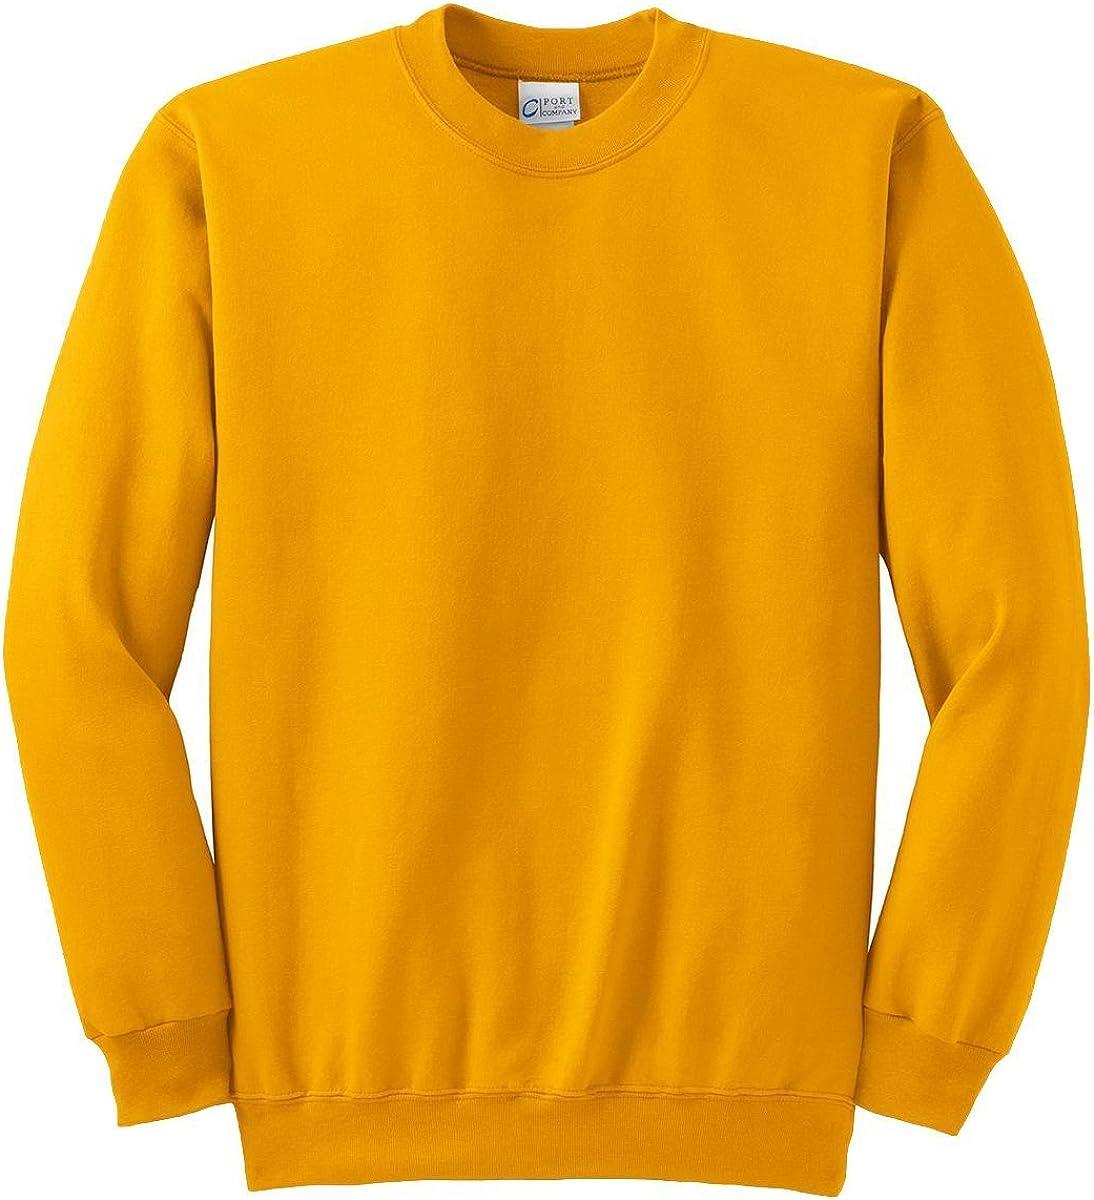 Port & Company Tall Ultimate Crewneck Sweatshirt. PC90T XXX-Large Tall Gold